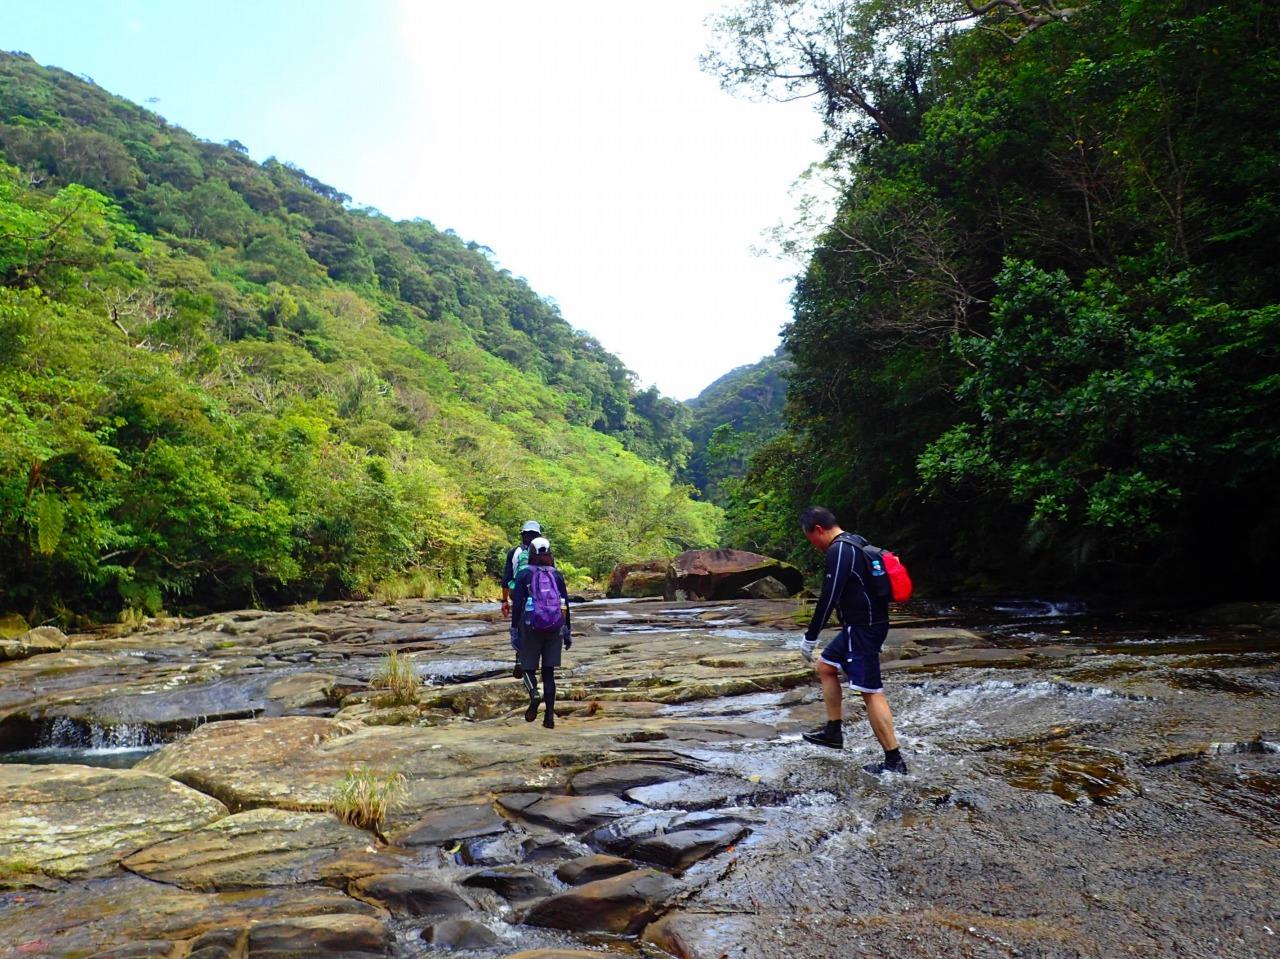 【GW特別企画】西表島大縦断と沖縄県最高峰 於茂登岳登頂 4日間